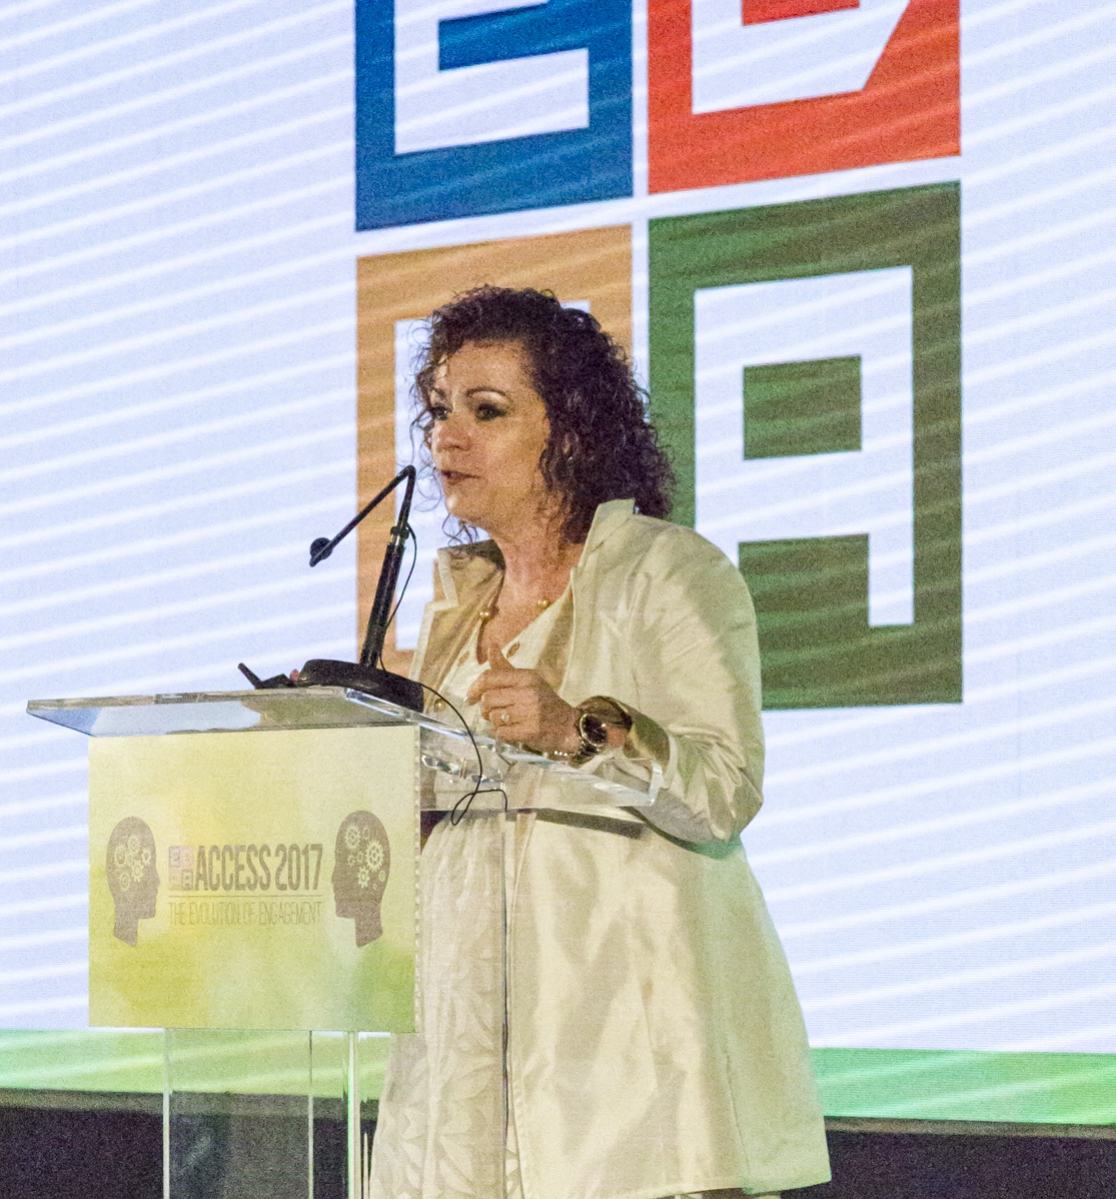 Donna Shultz speaking at ACCESS 2017